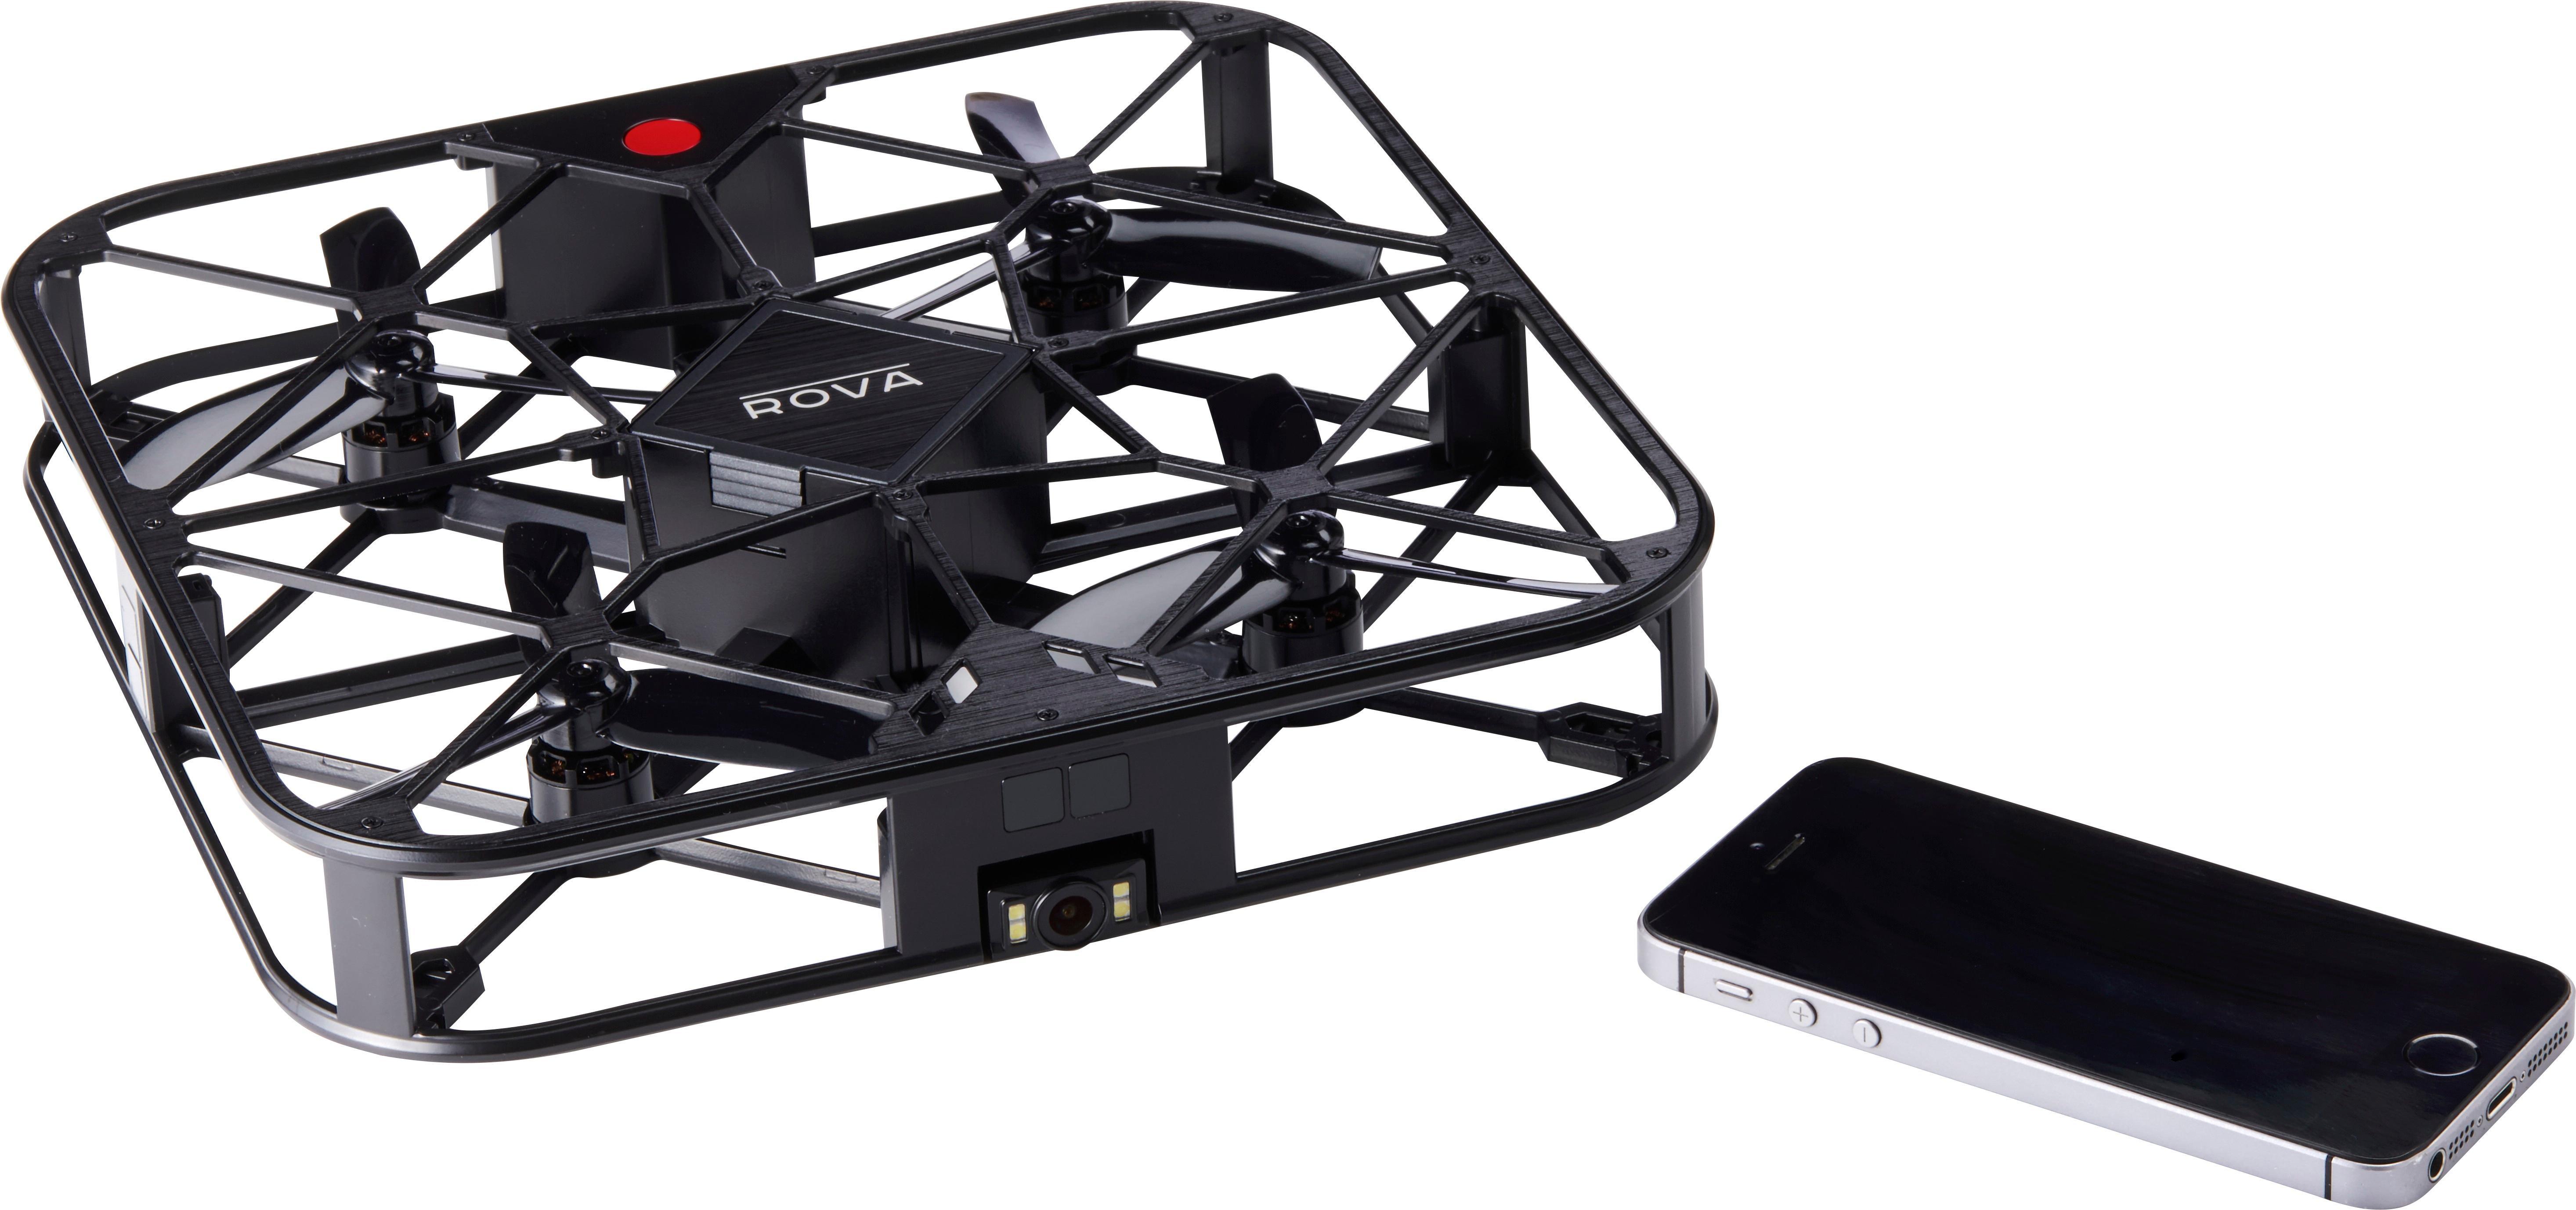 Rova - Selfie Drone - Black